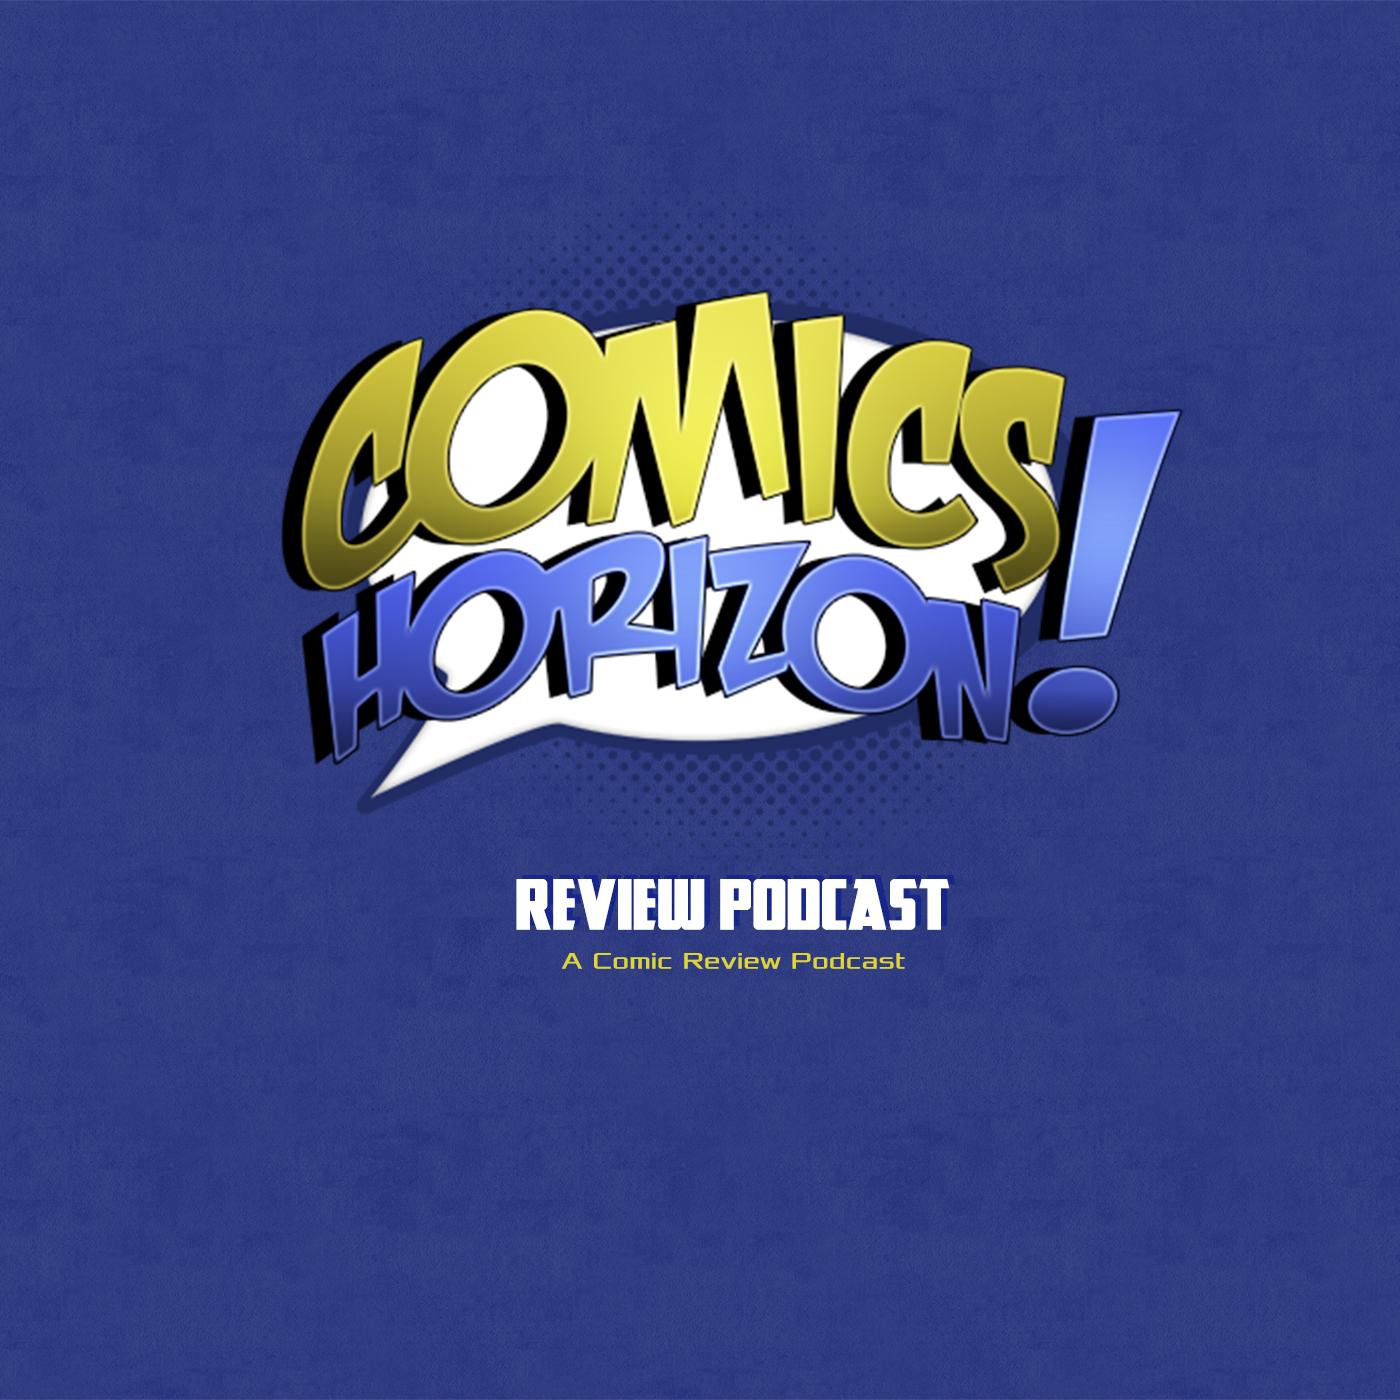 Comics Horizon Podcast show art